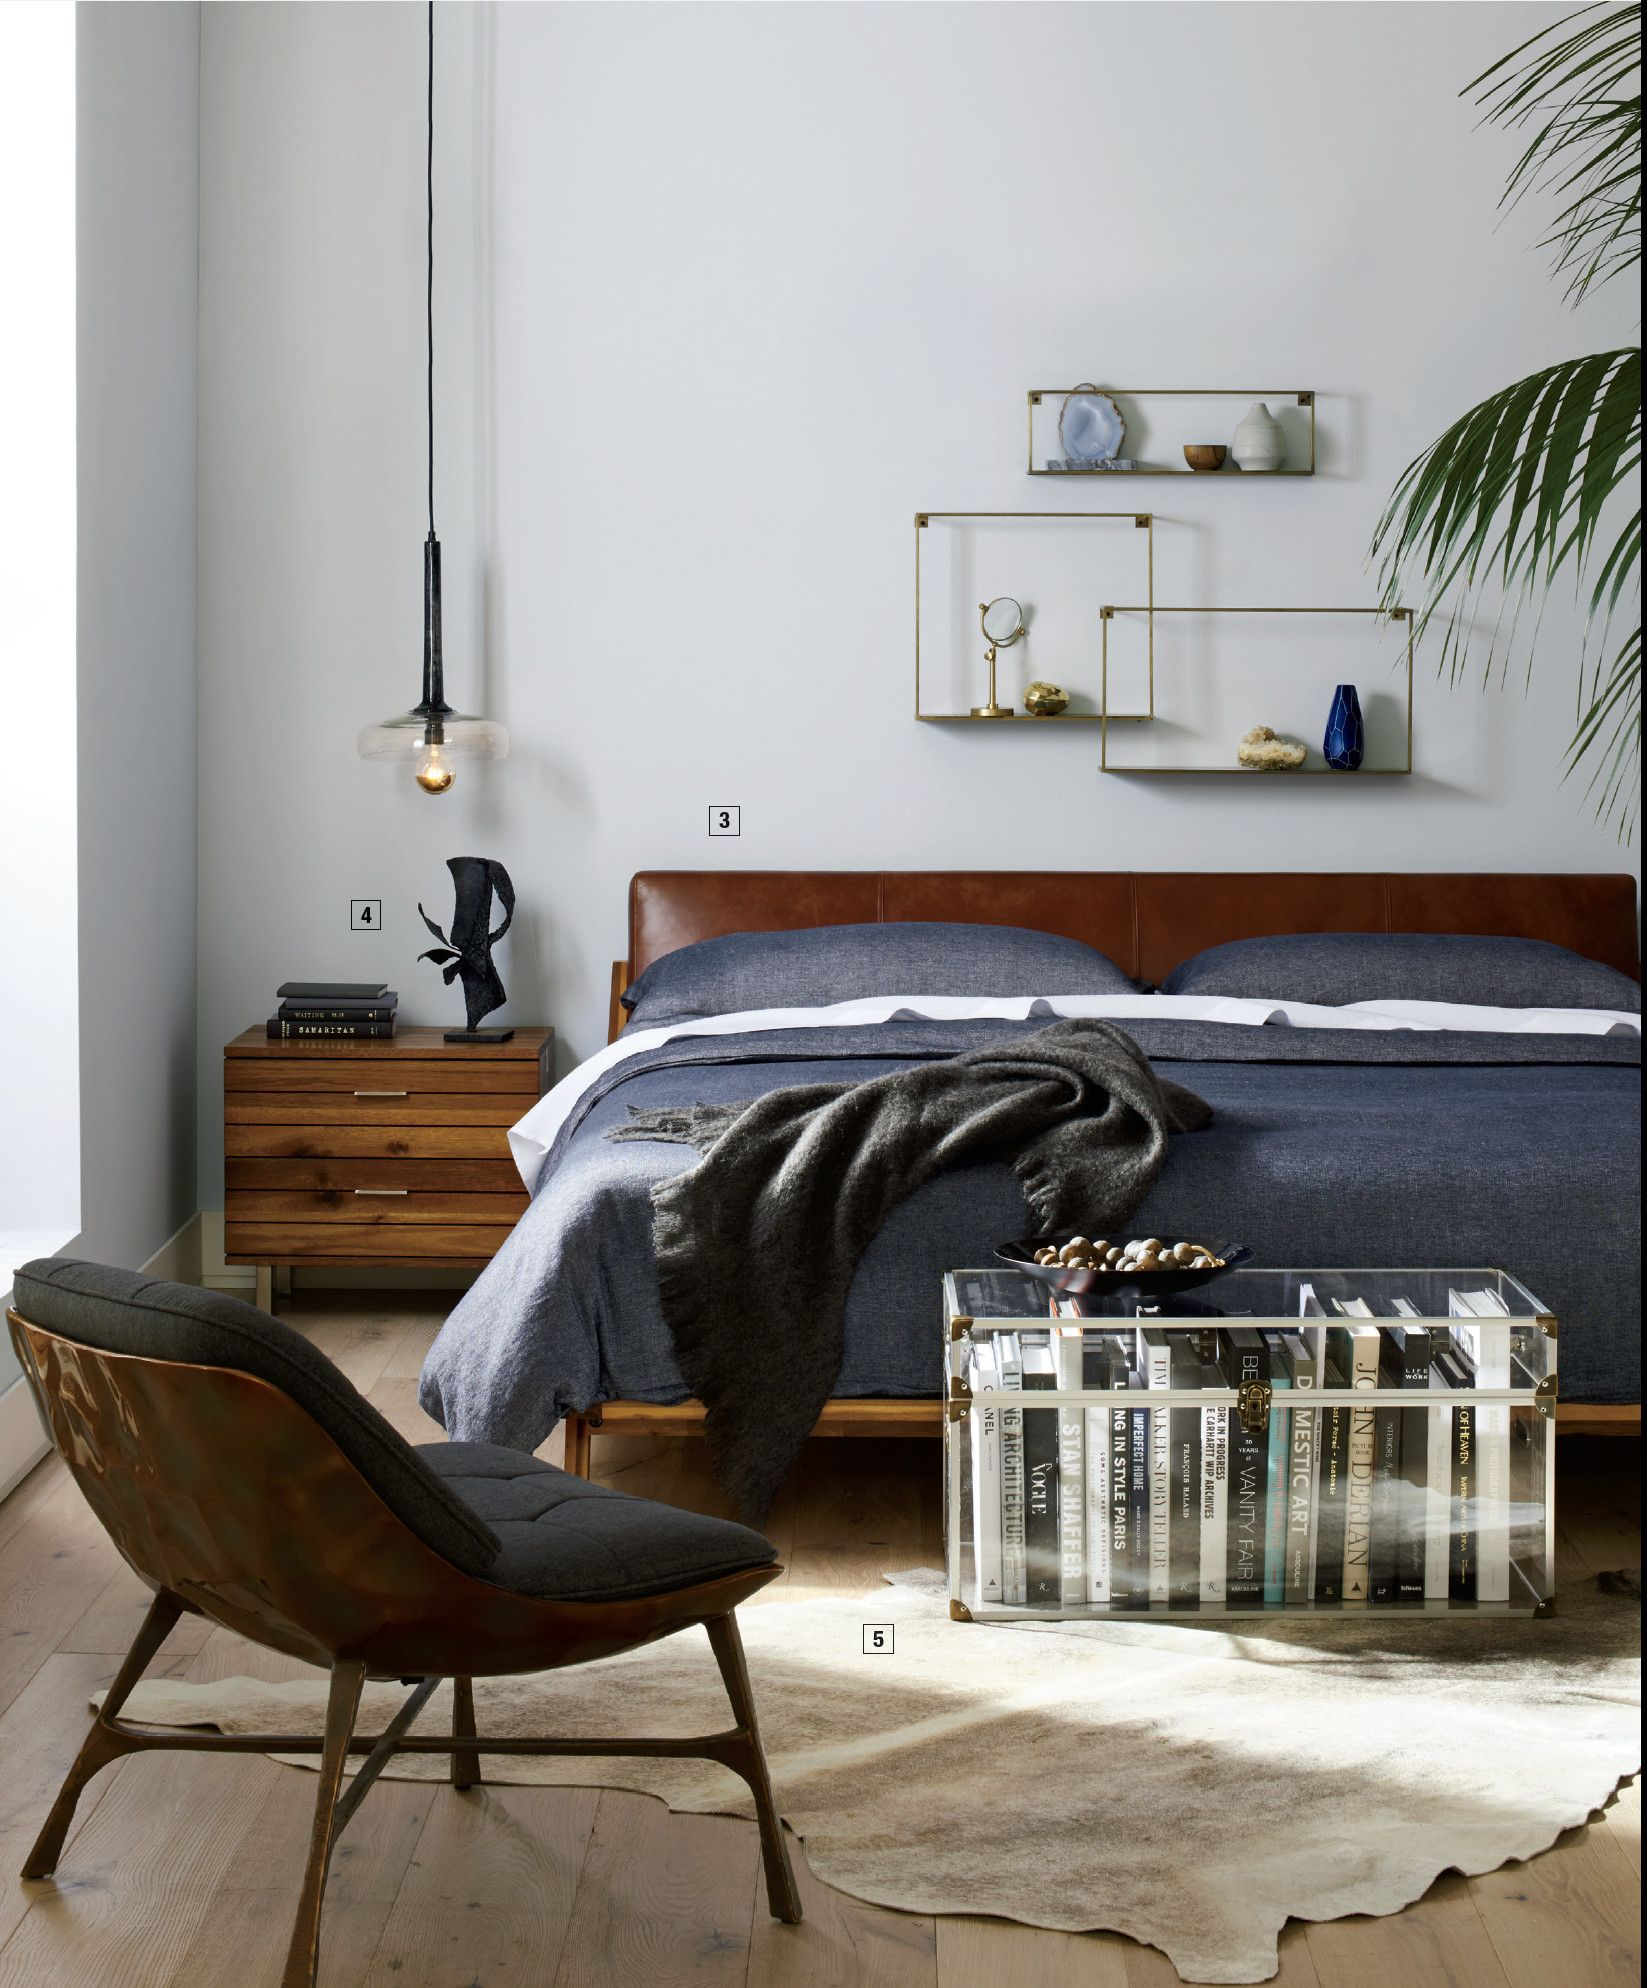 Mod Large Clear Trunk Reviews Cb2 In 2021 Mens Bedroom Decor Mens Apartment Decor Bedroom Interior